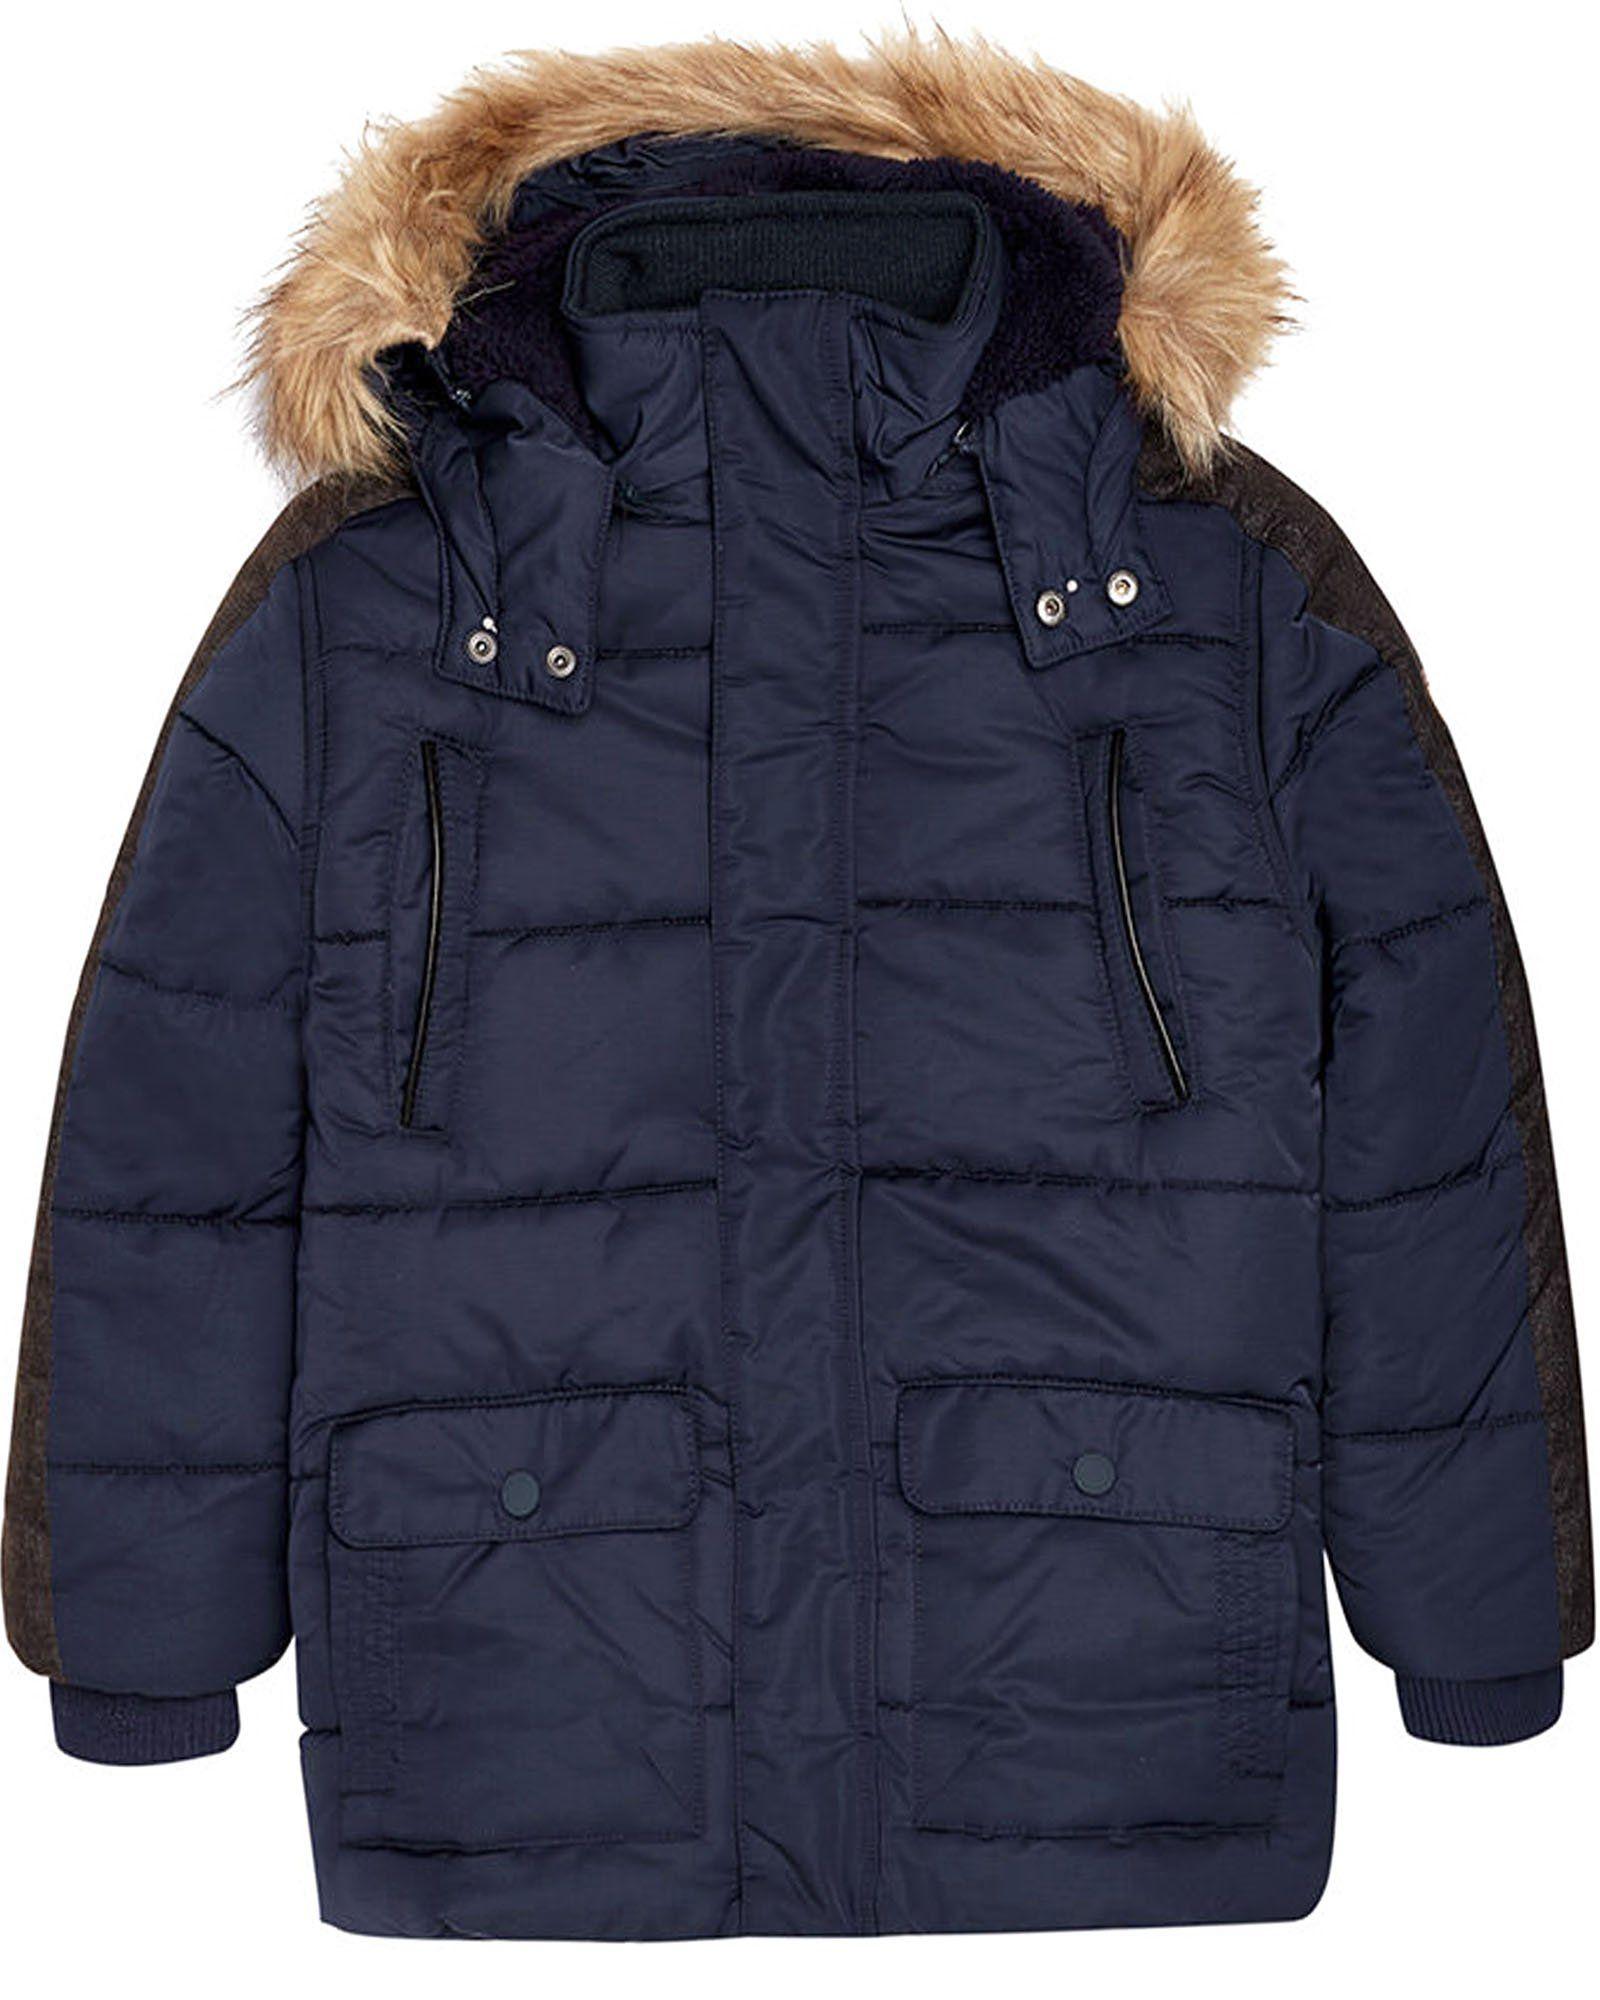 c5981b4188a5 Mayoral Junior Boy s Navy Parka Coat